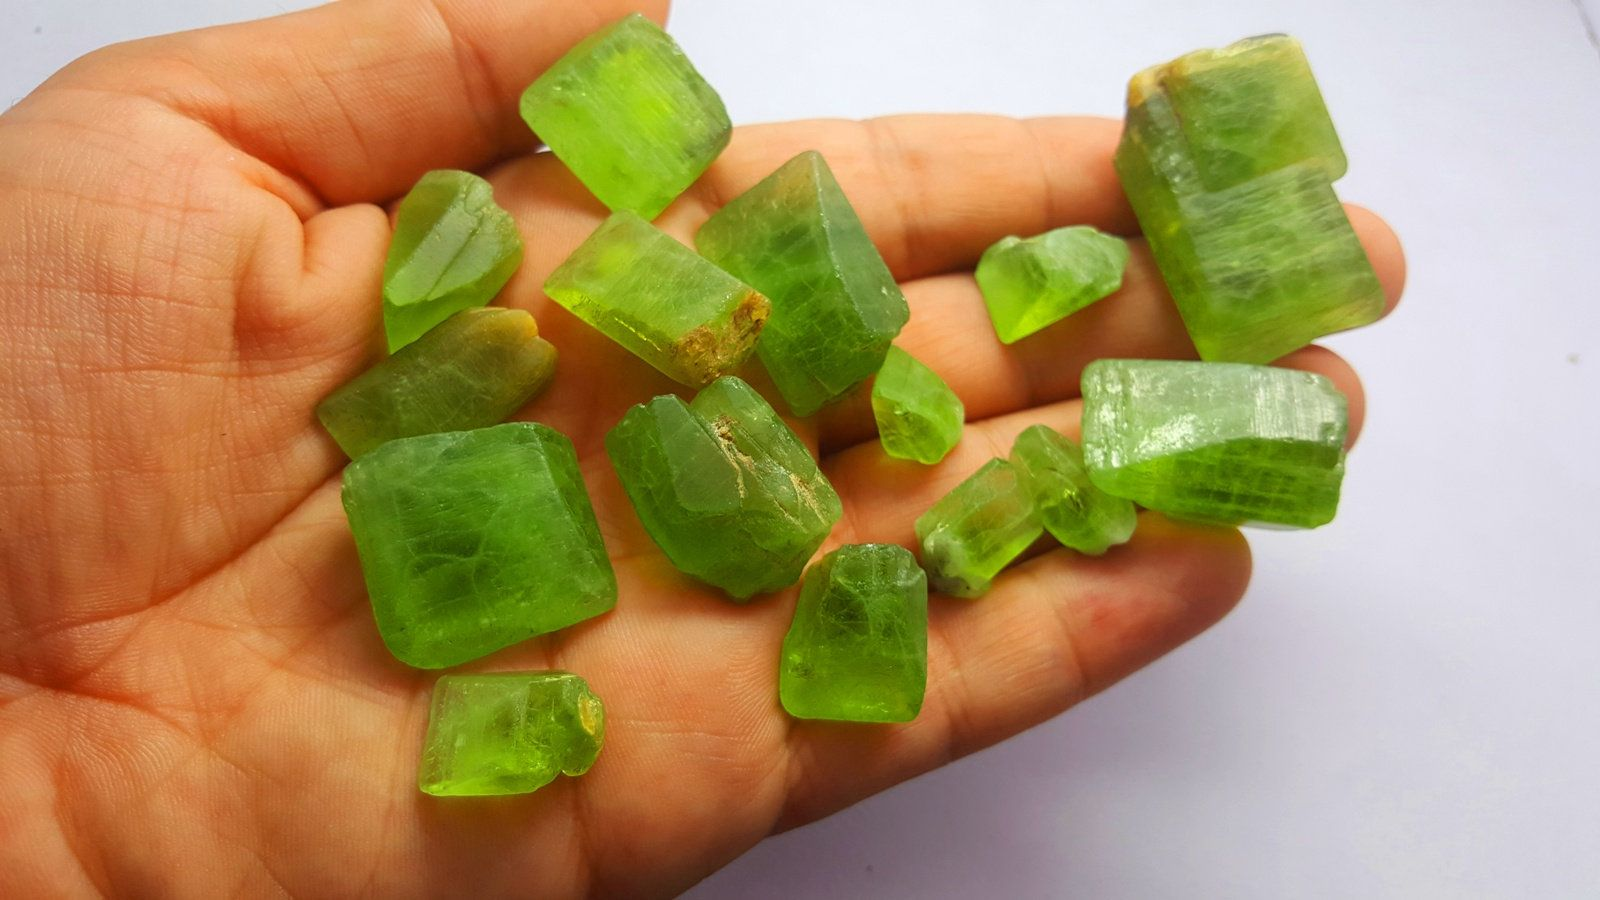 500 Carat Peridot Crystals From Pakistan | Etsy | Peridot